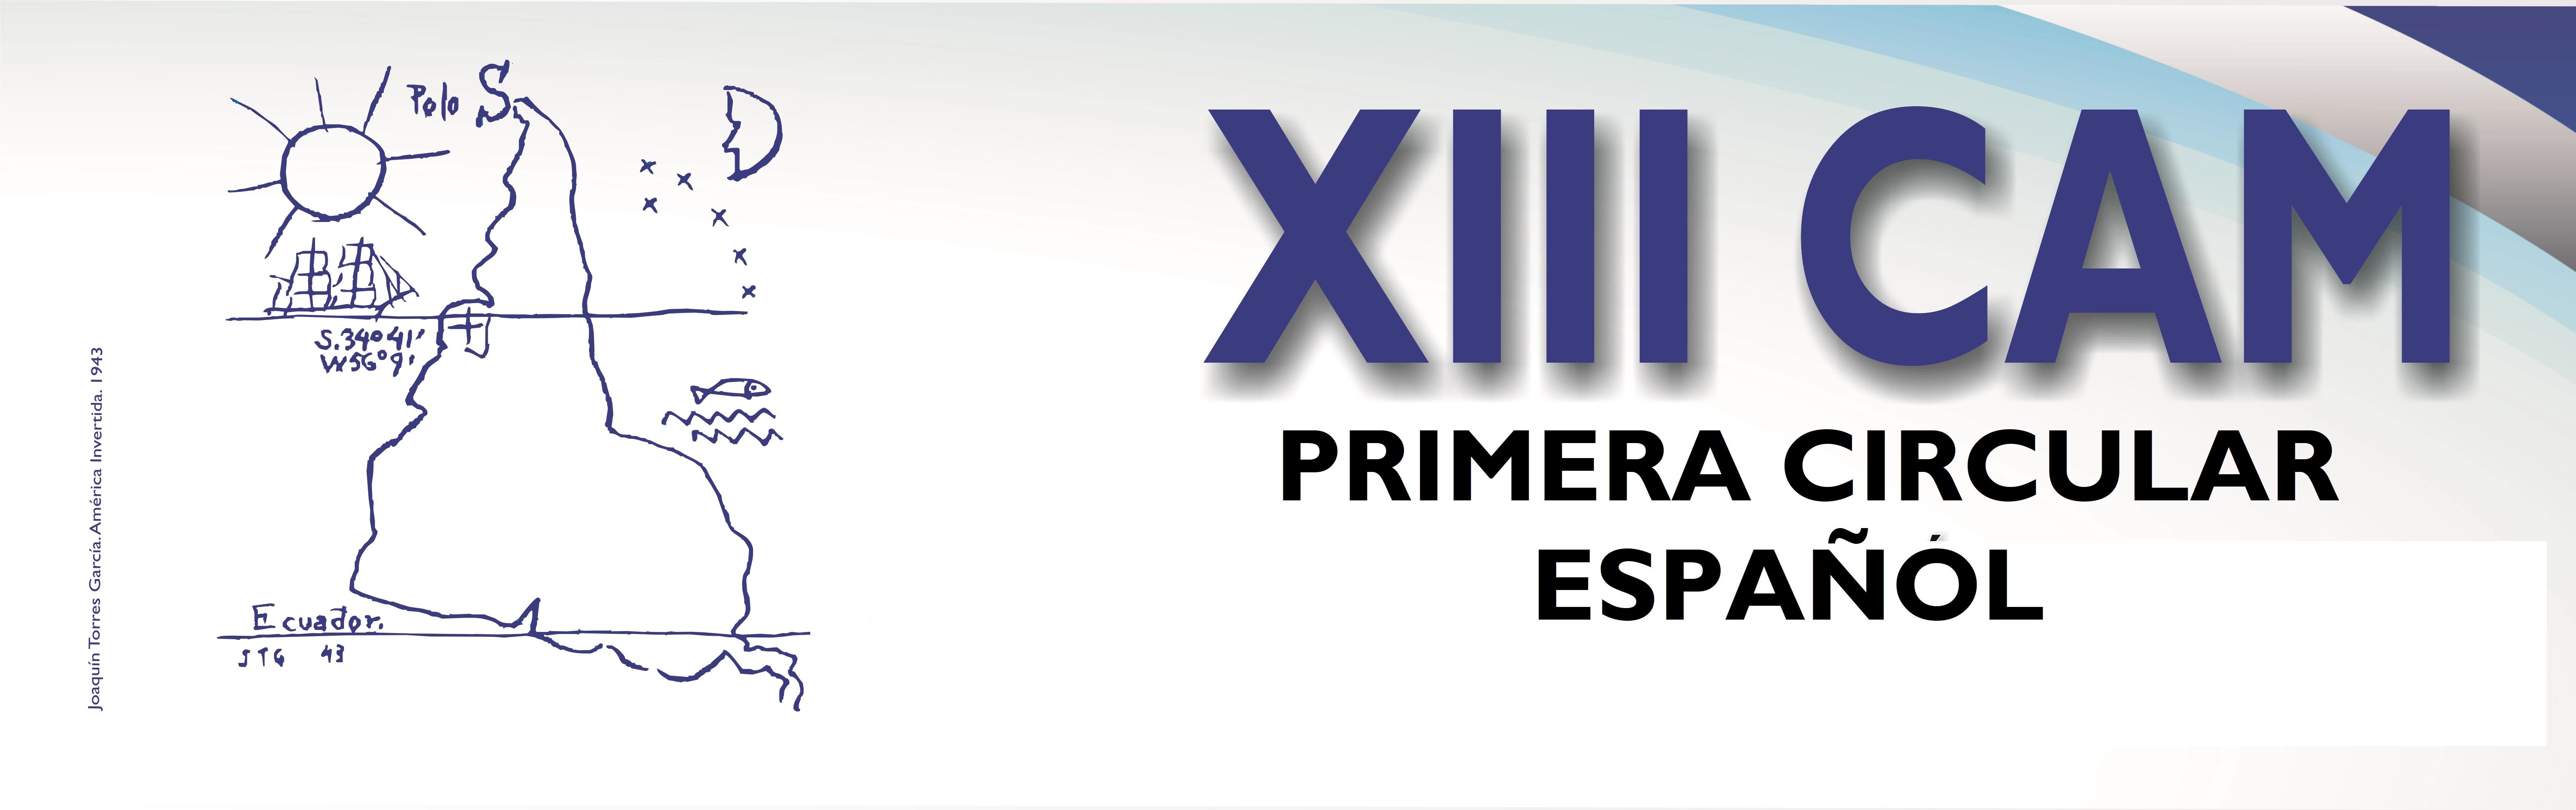 LOGO PRIMERA CIRCULAR